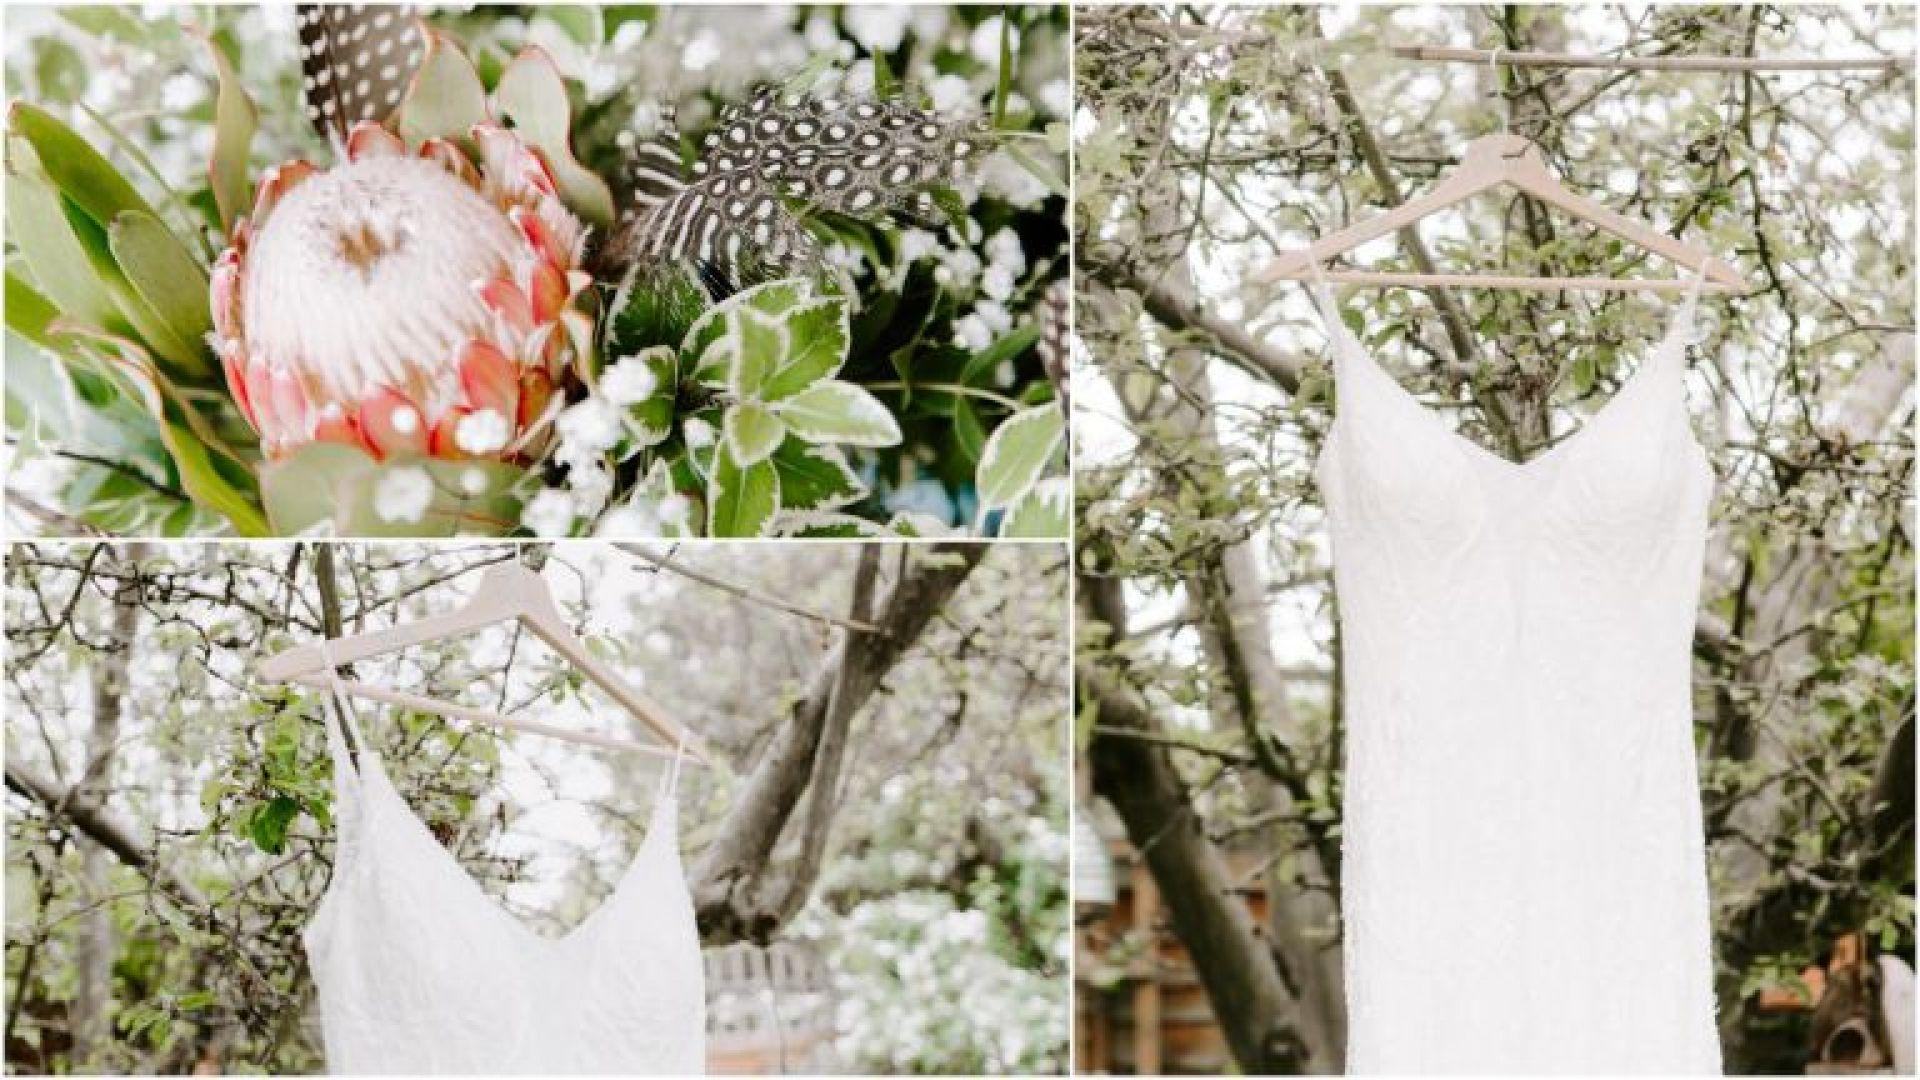 Wedding dress hanging from a treeWedding photography Hertfordshire